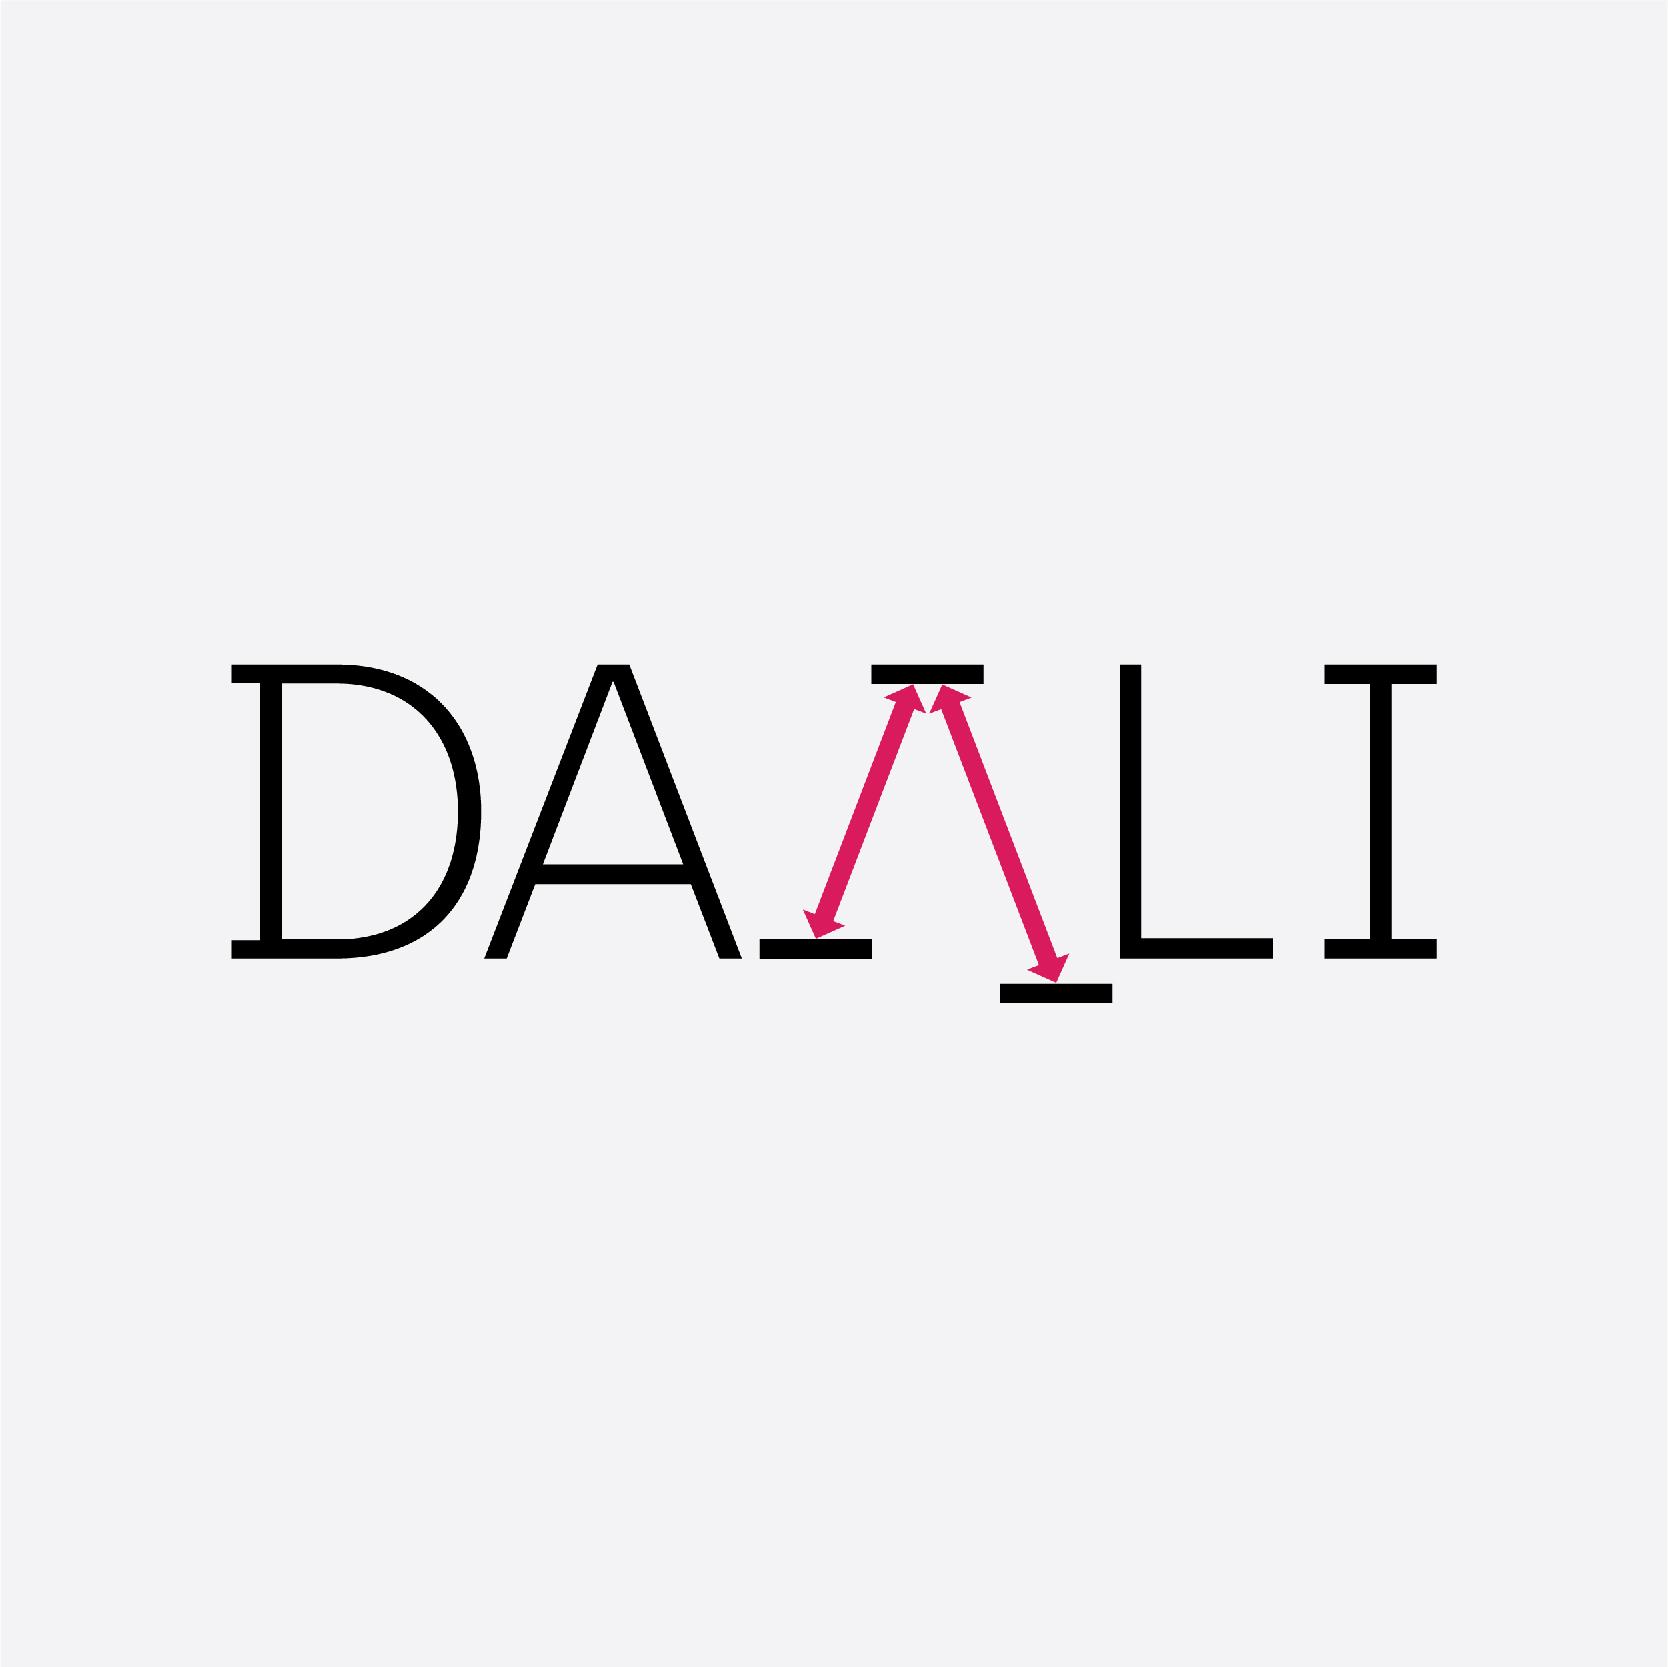 ICFO-Logos-Daniel-Cavalcanti-DAALI